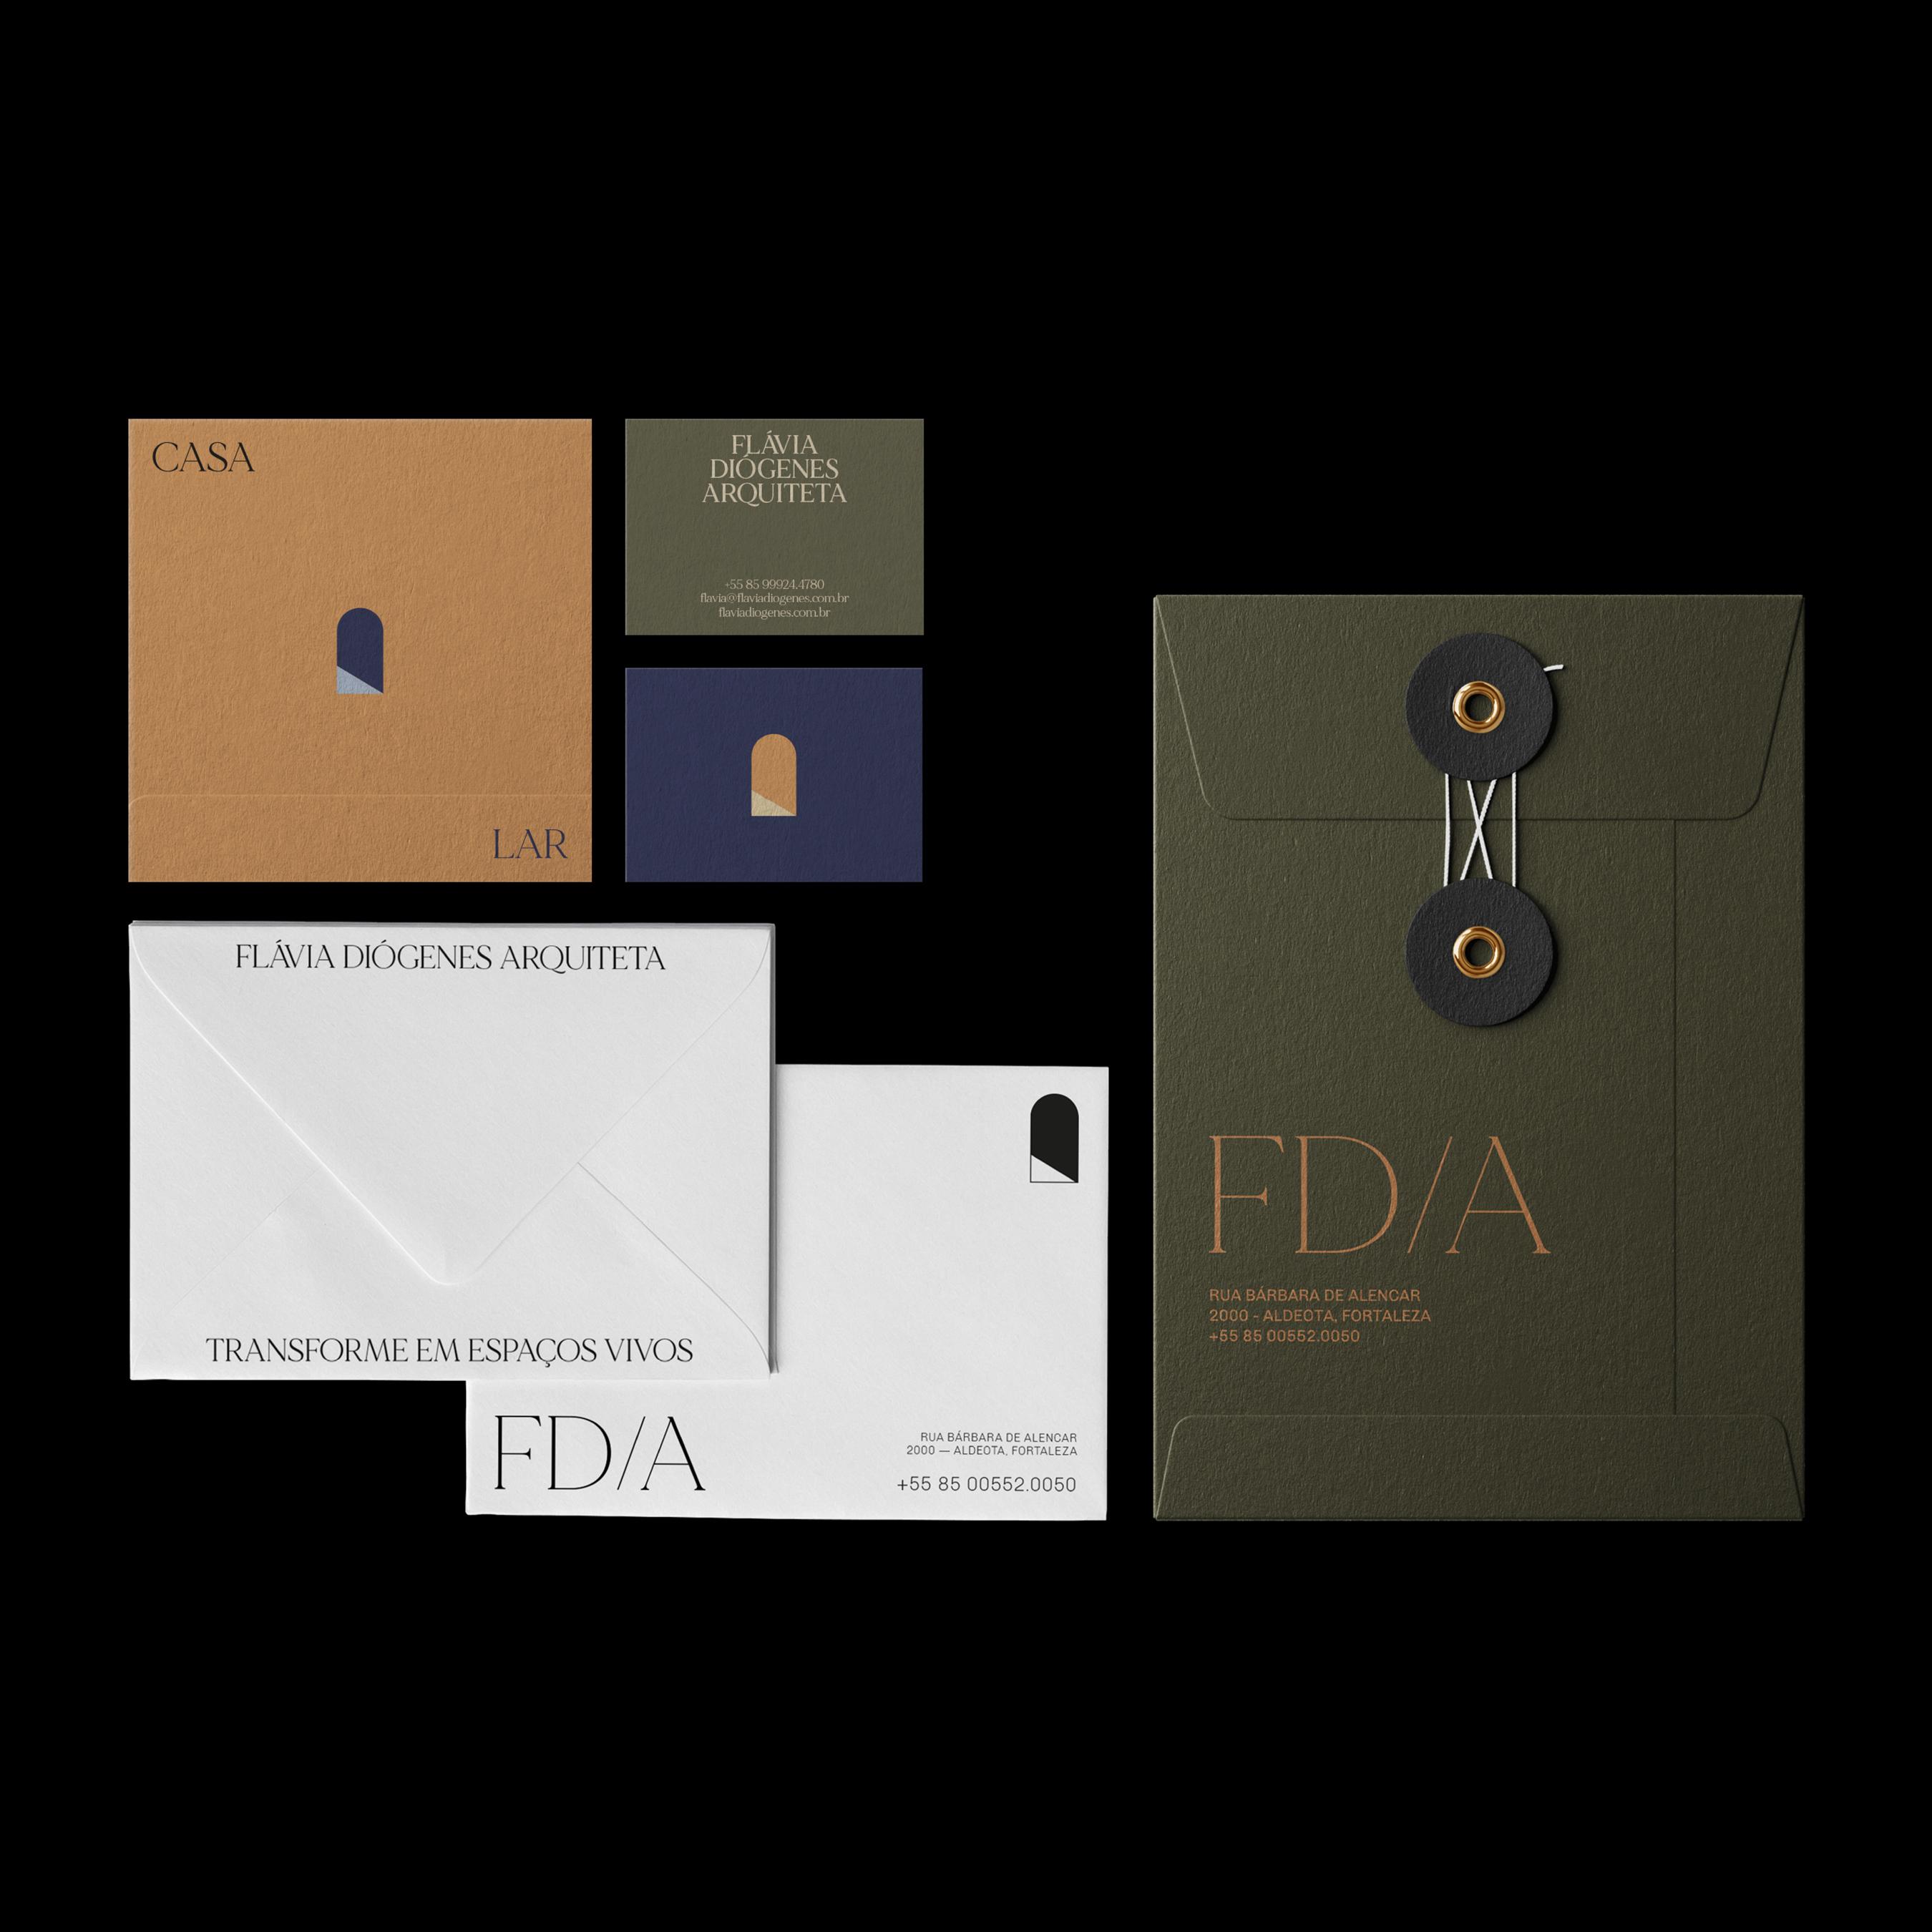 Carta&Carta Creates a New Brand Project for FD/A